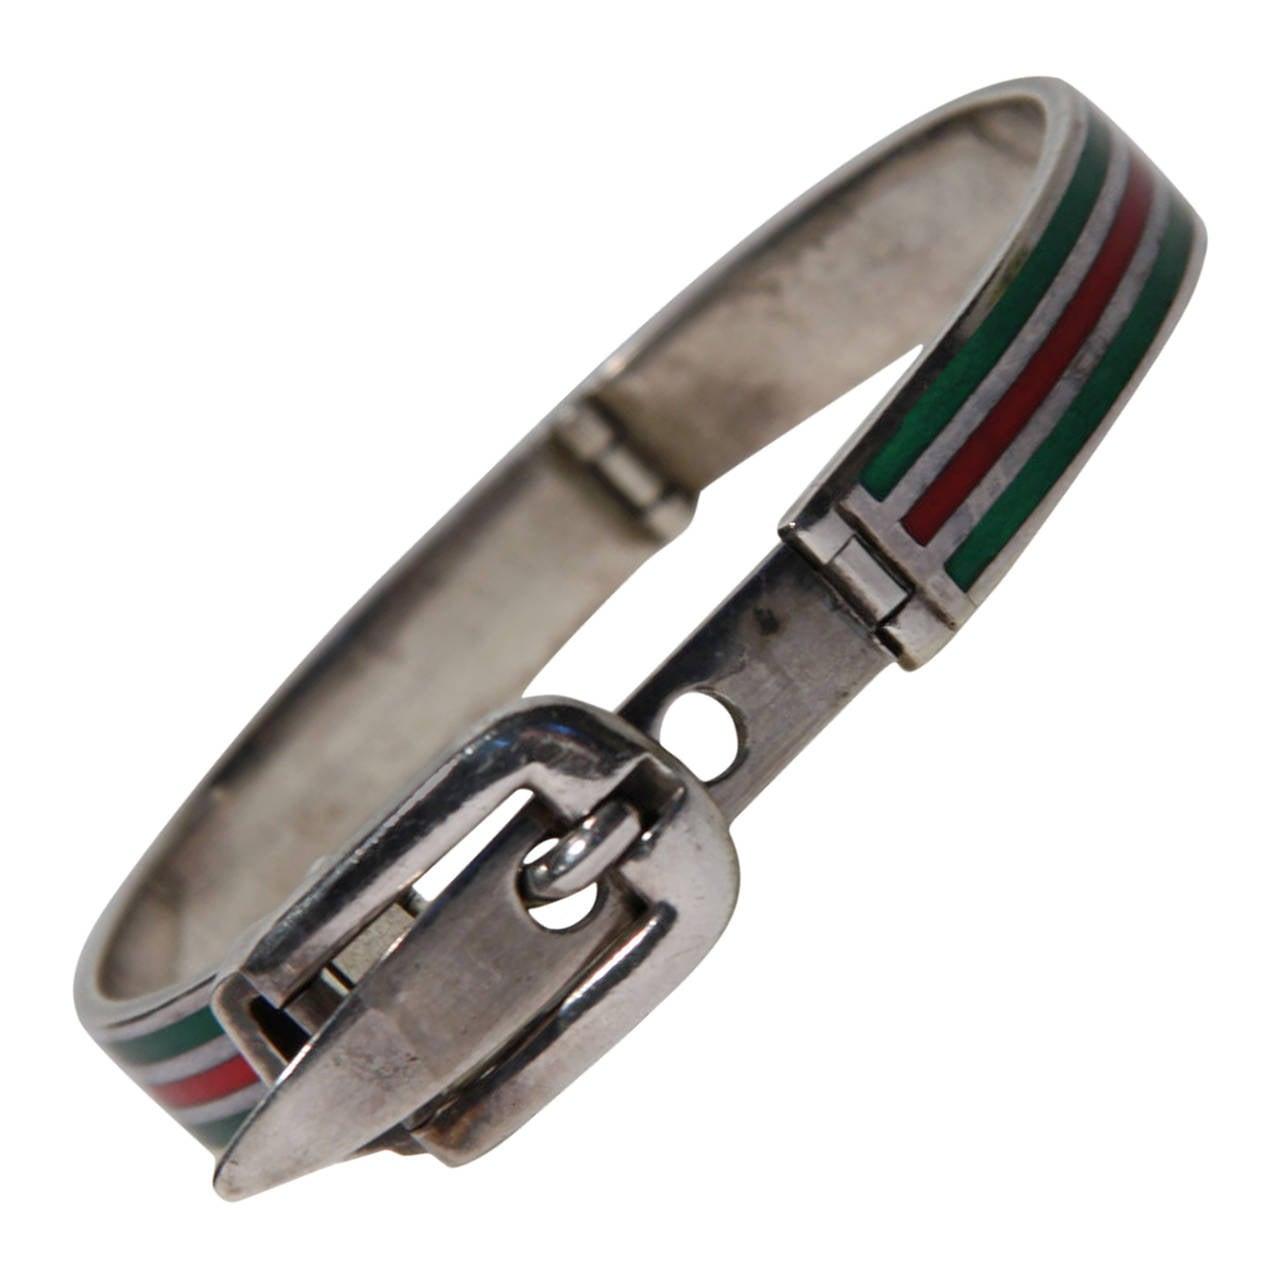 b9ebd4b578f02 Auth GUCCI VINTAGE Sterling Silver 925 & Enamel Stripes BELT BRACELET Bangle